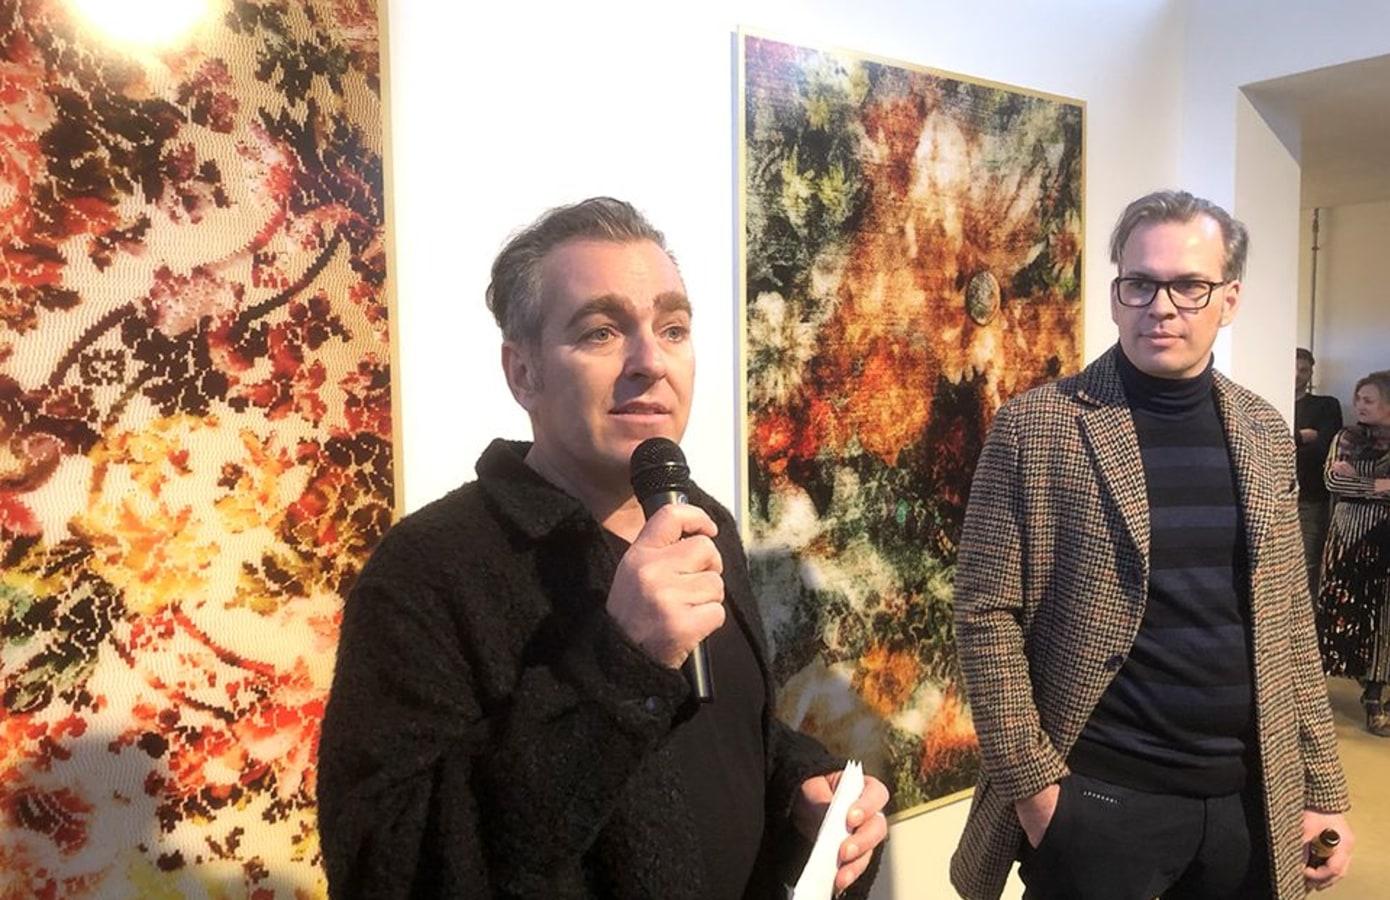 Artistic Midlife Crisis of a Storyteller @Pennings, Tom Woestenborghs,